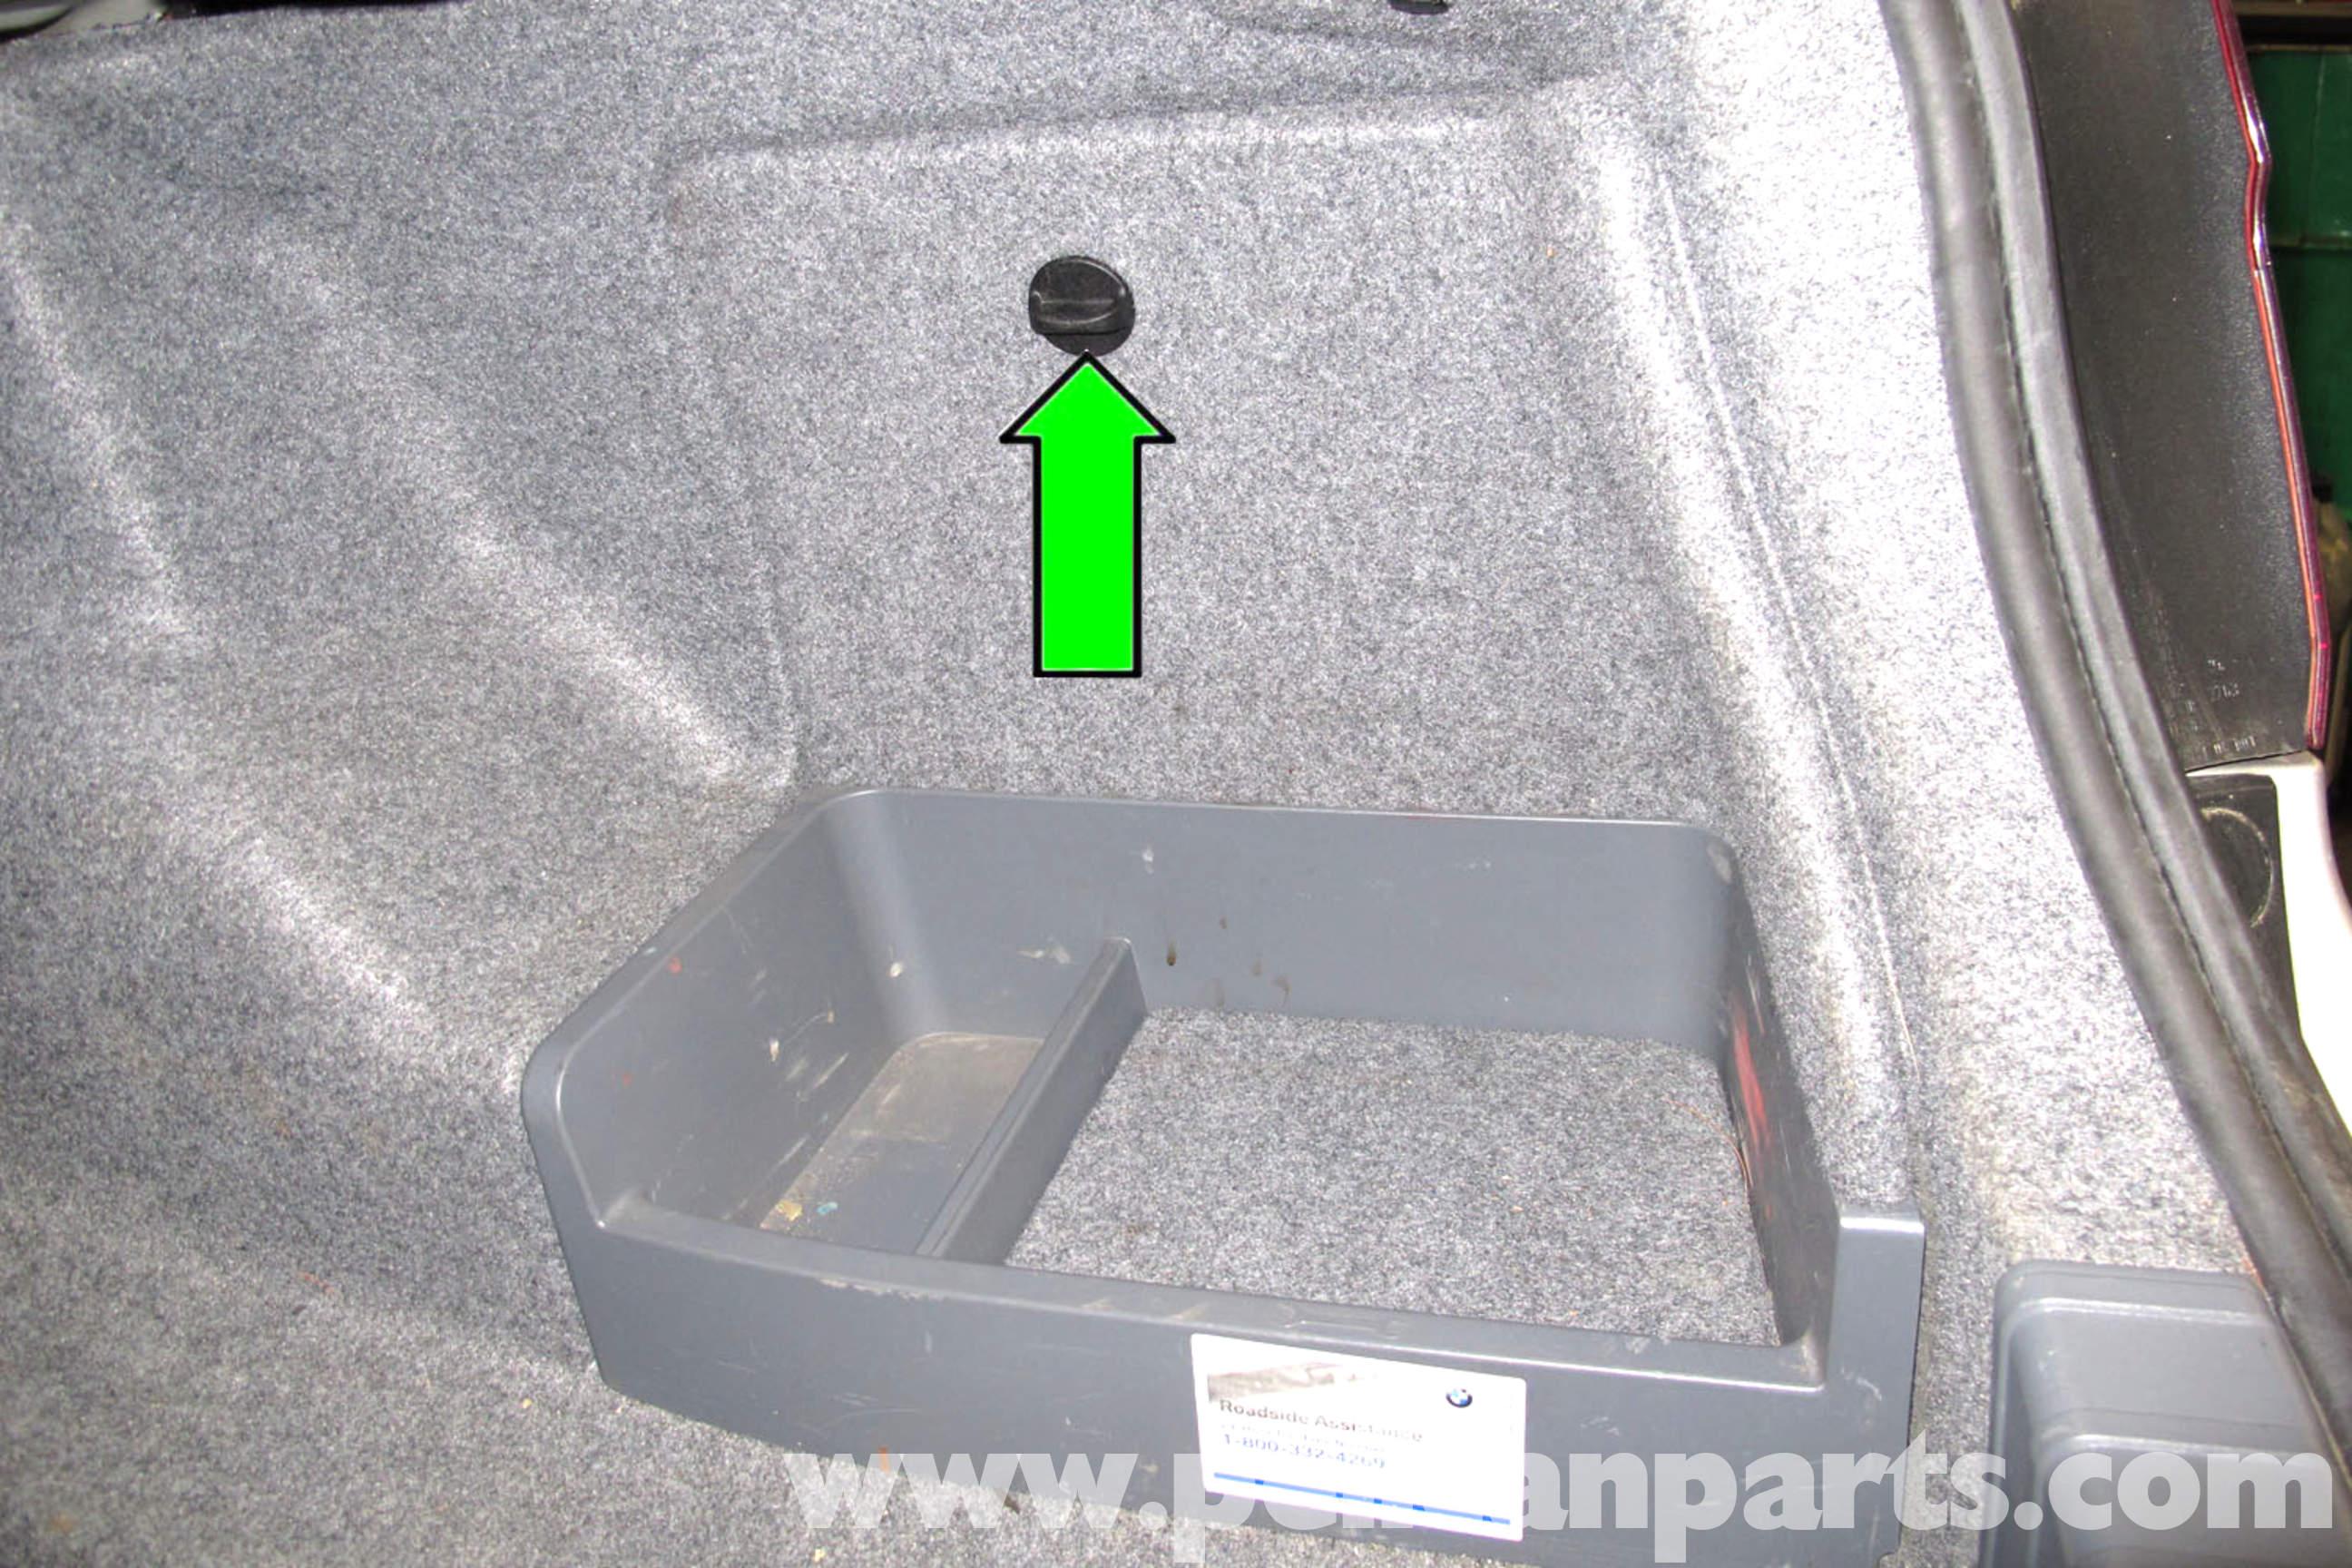 BMW E90 Battery Replacement | E91, E92, E93 | Pelican Parts DIY